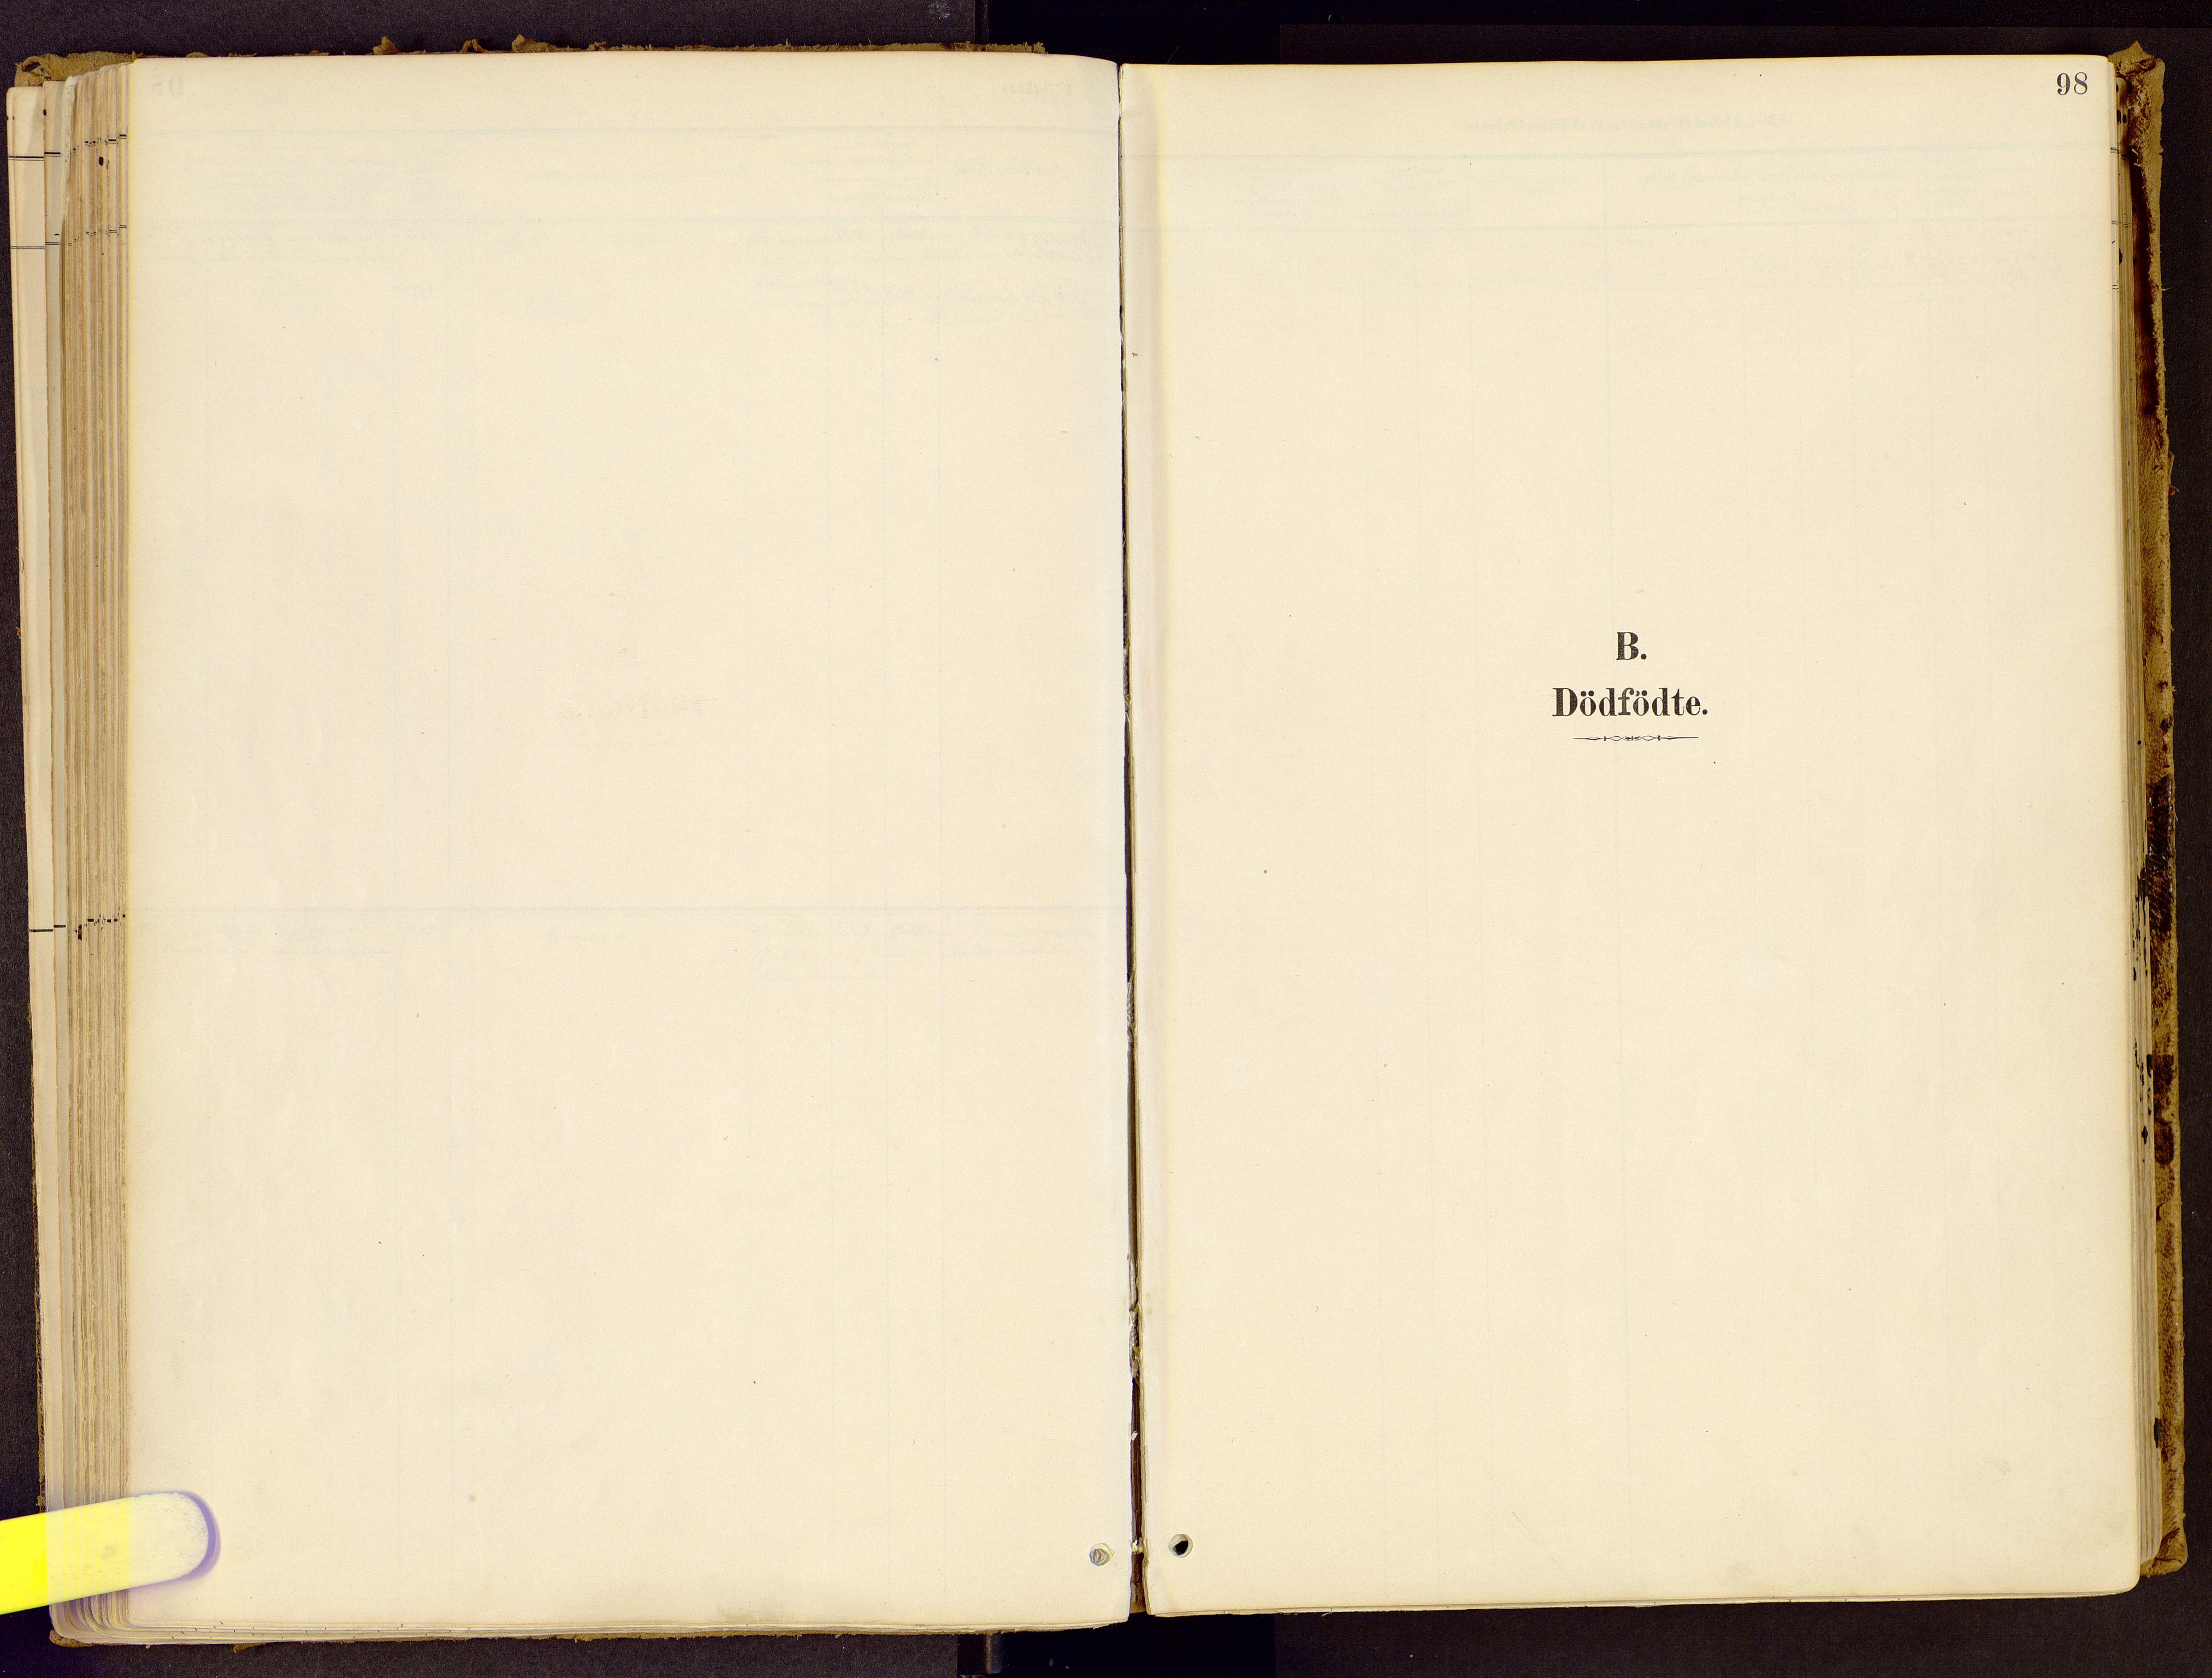 SAH, Vestre Gausdal prestekontor, Ministerialbok nr. 1, 1887-1914, s. 98